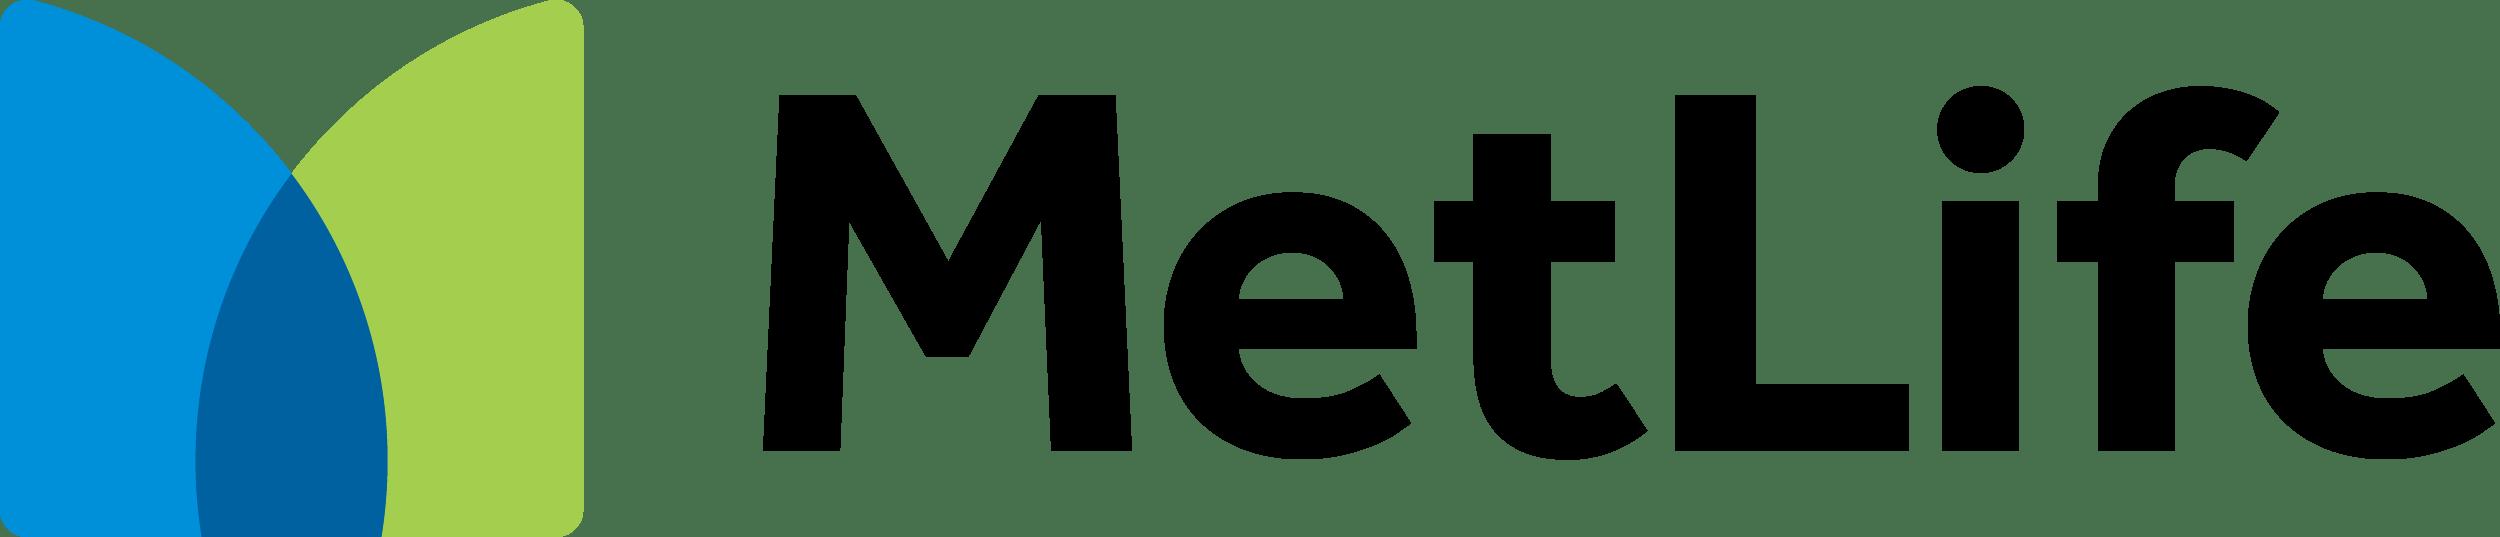 Metlife Burial Insurance